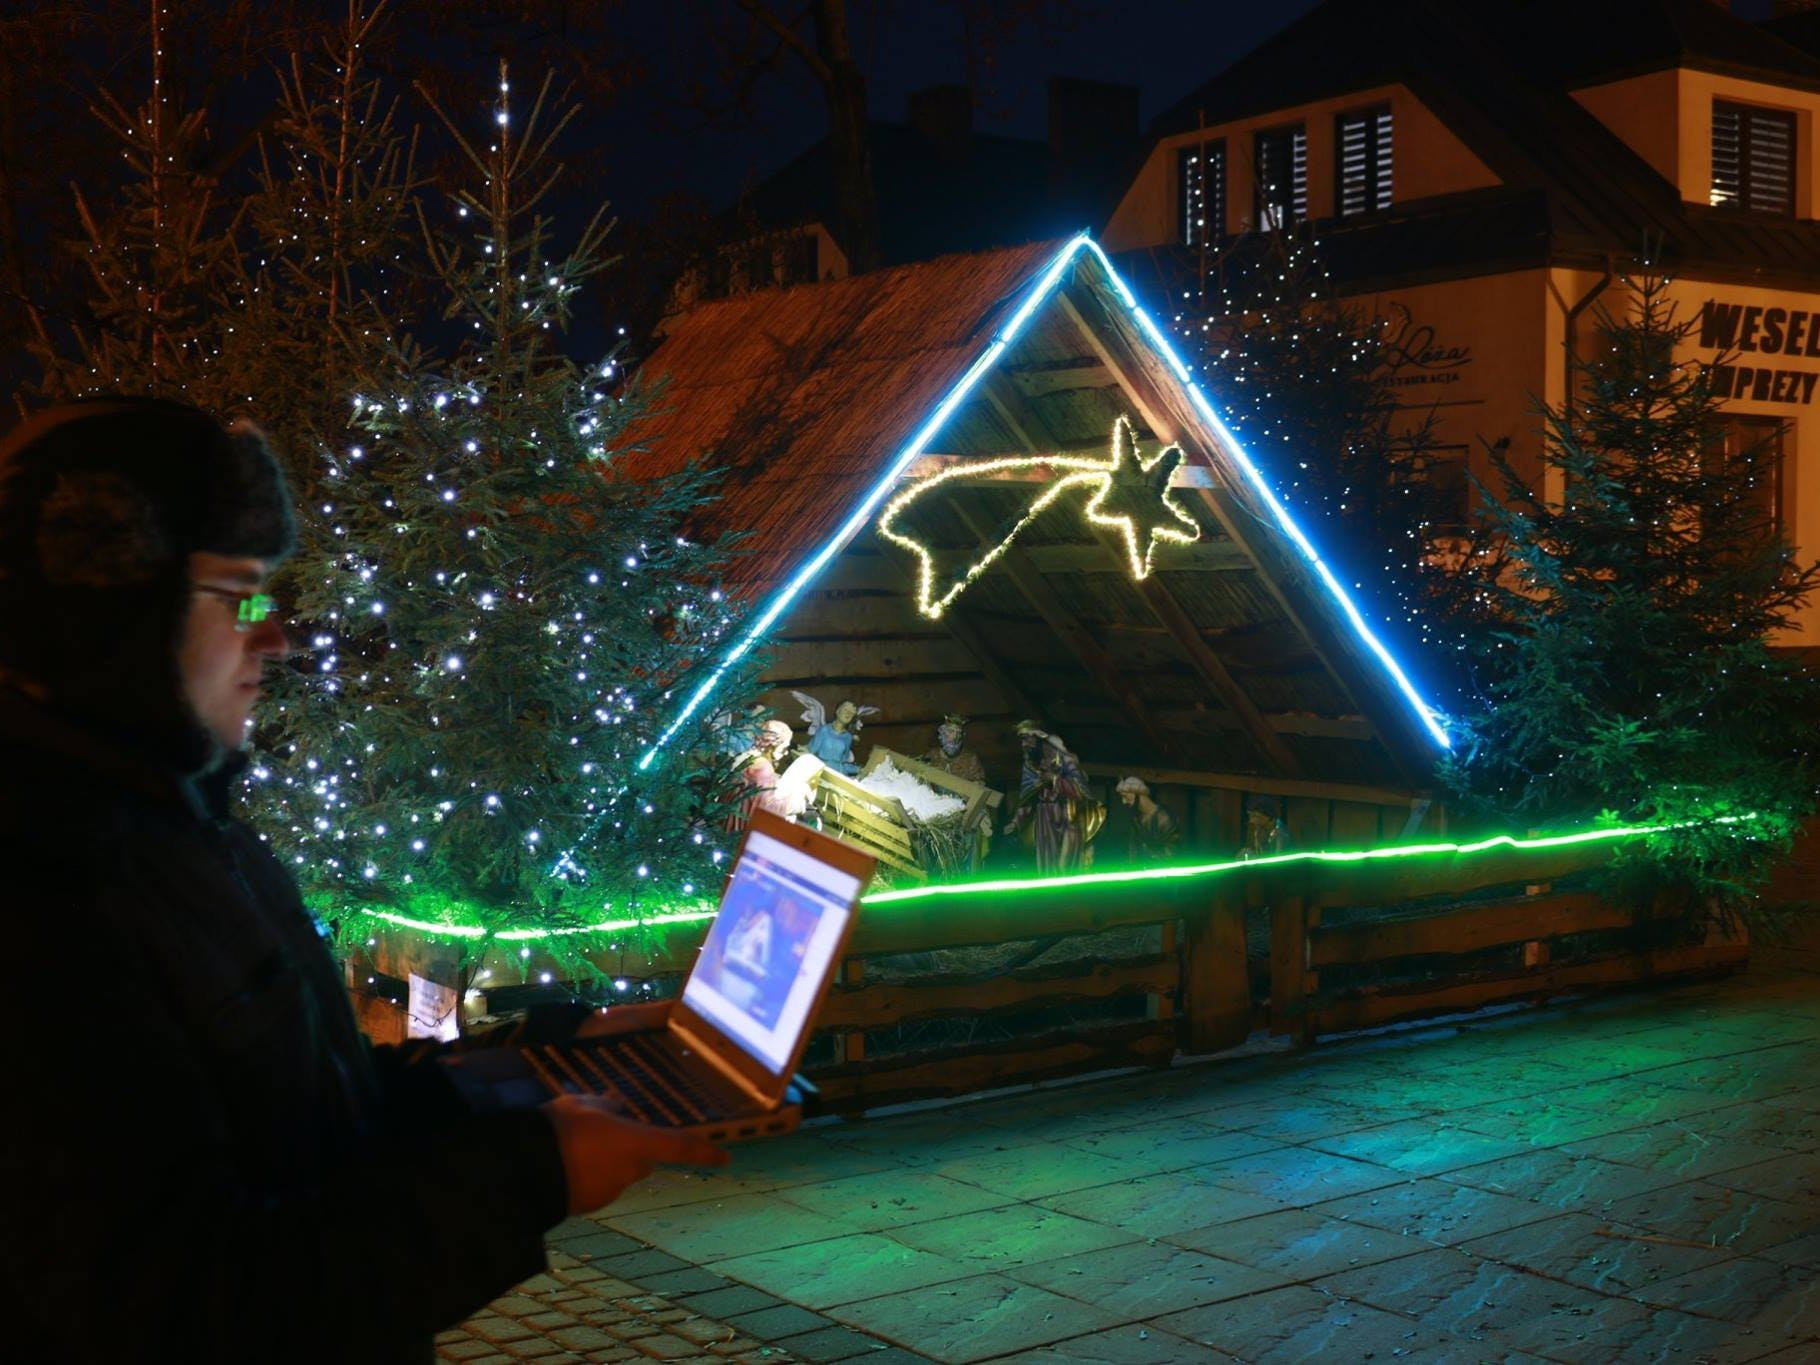 Christmas Crib Controlling via Internet